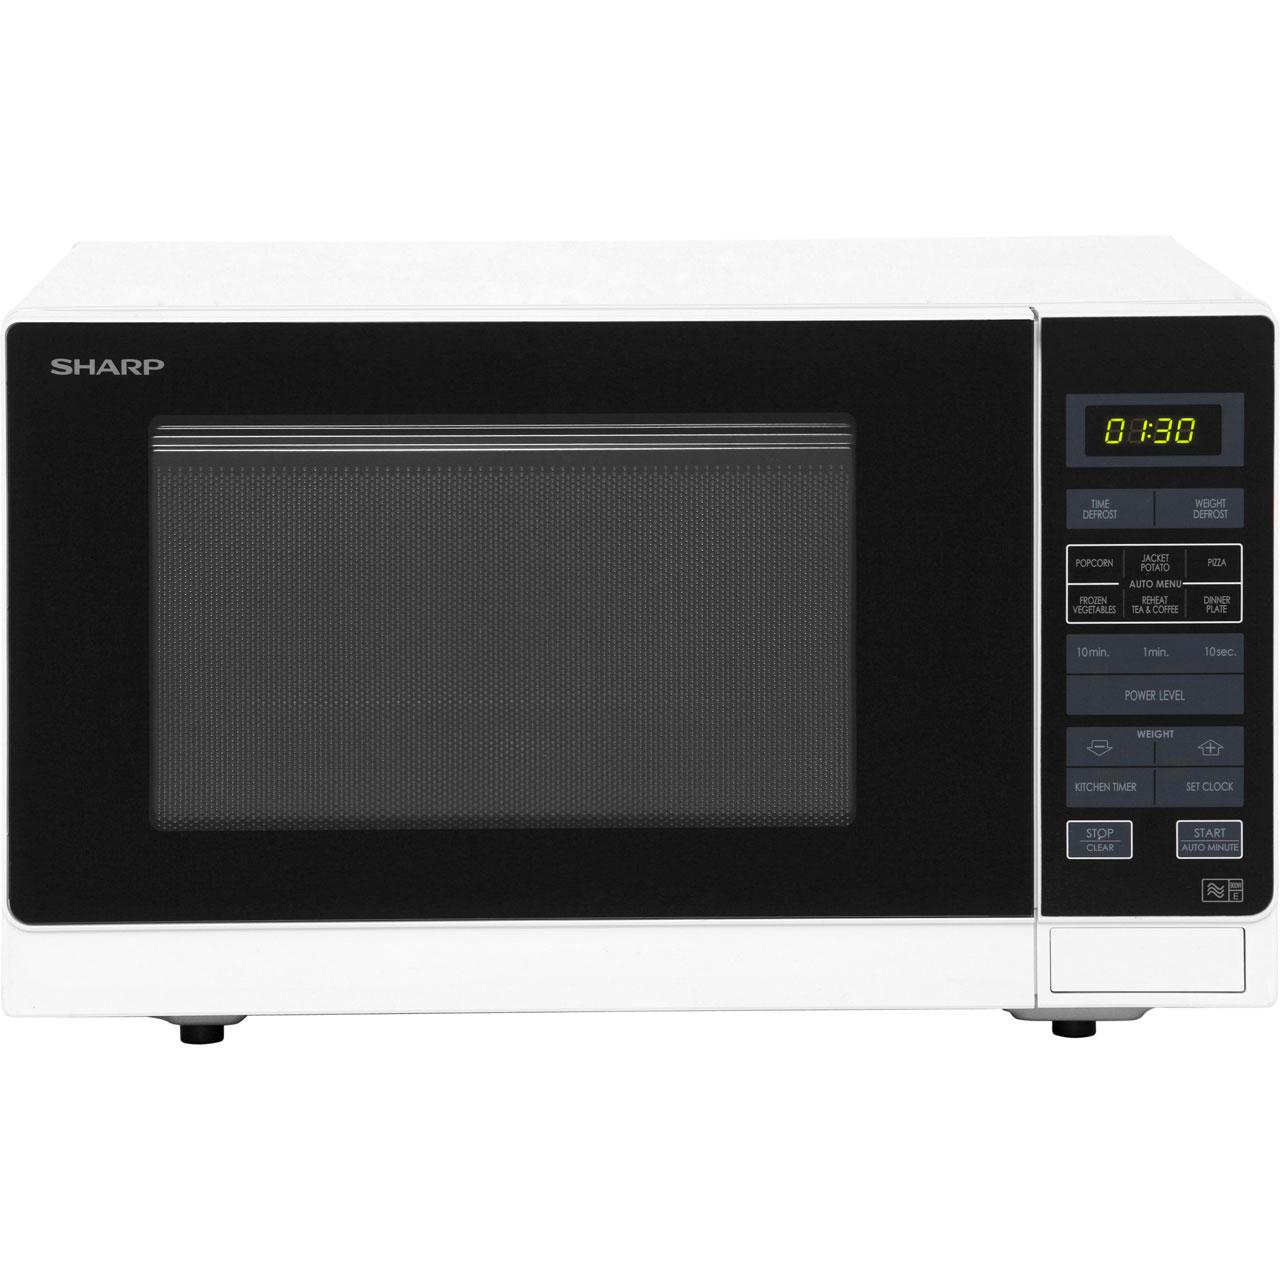 sharp r372wm white 900watt 25litre microwave oven